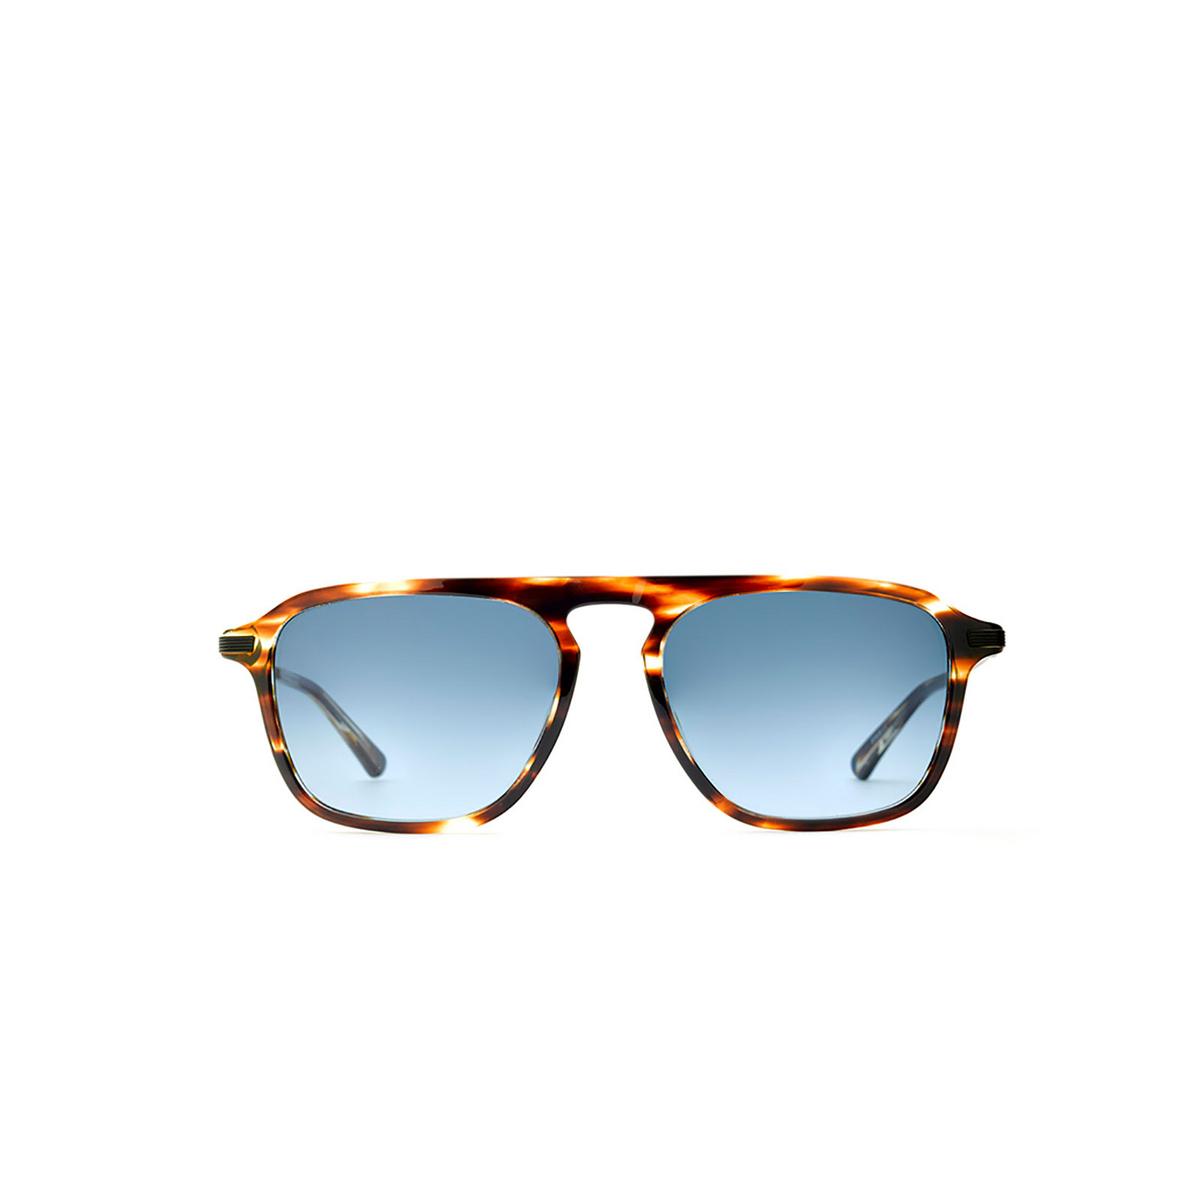 Etnia Barcelona® Square Sunglasses: Rodeo Drive Sun color Hvbk.